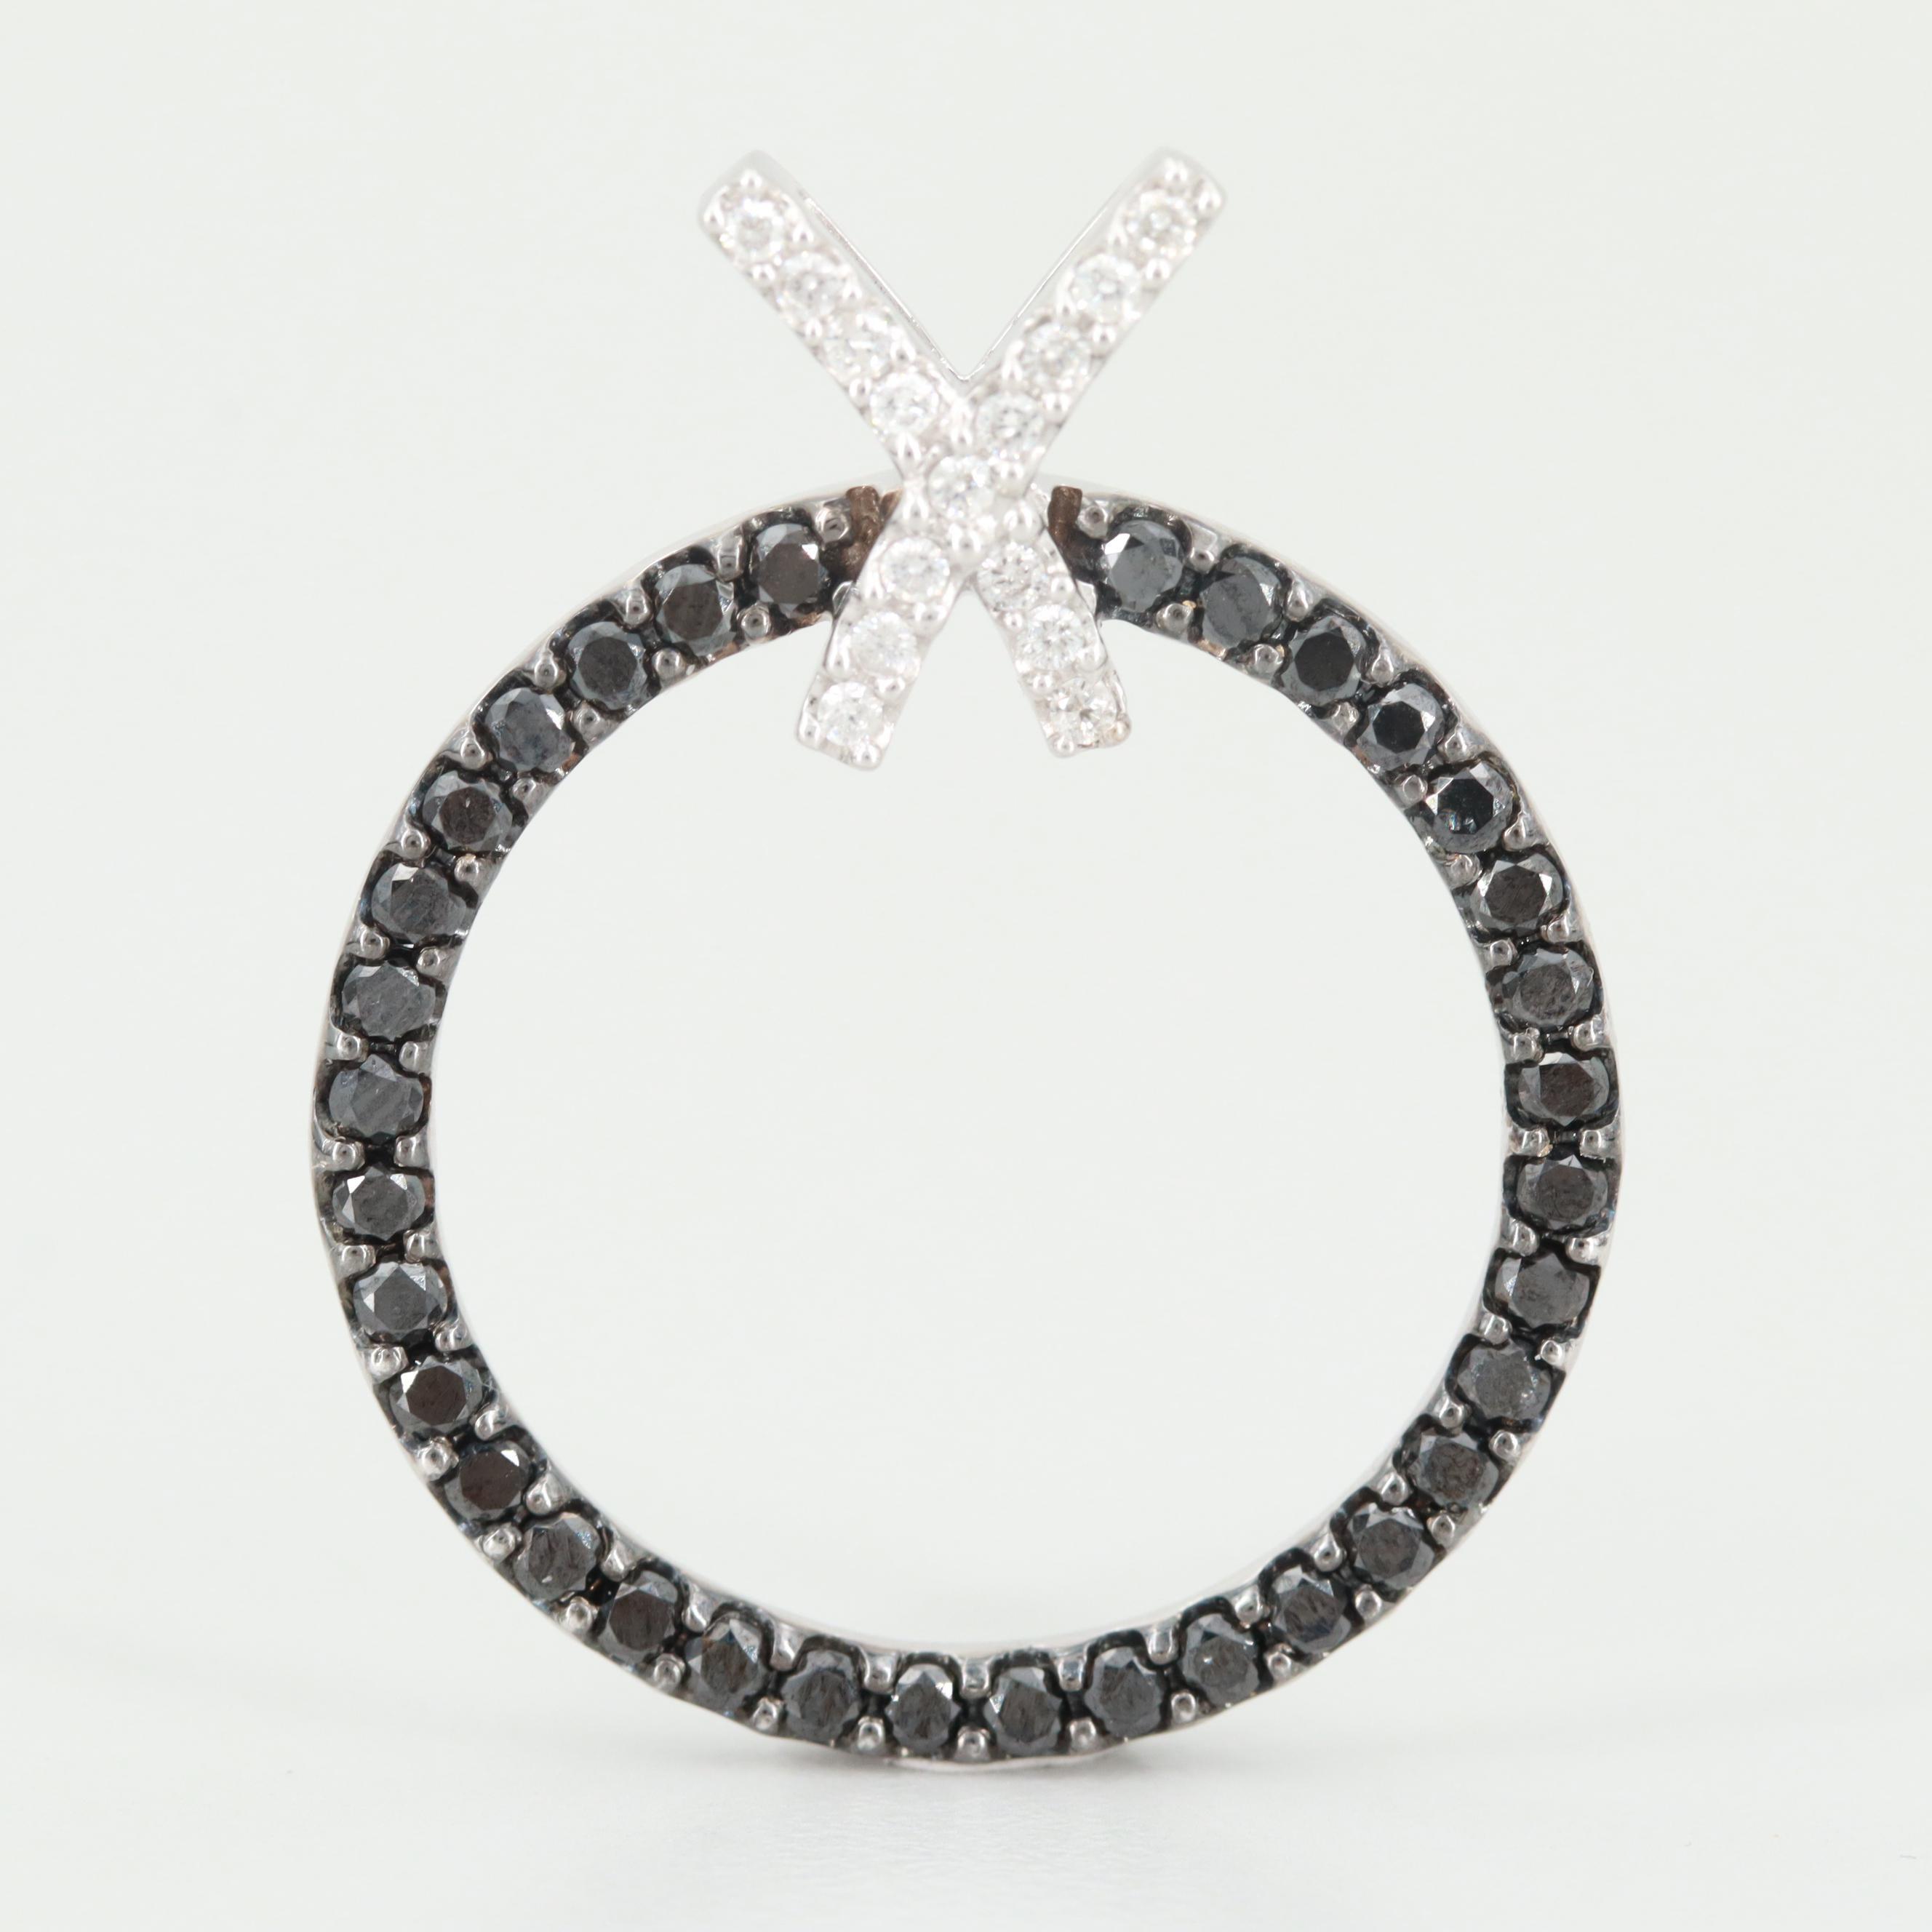 14K White Gold 1.17 CTW Diamond Pendant with Black Diamonds